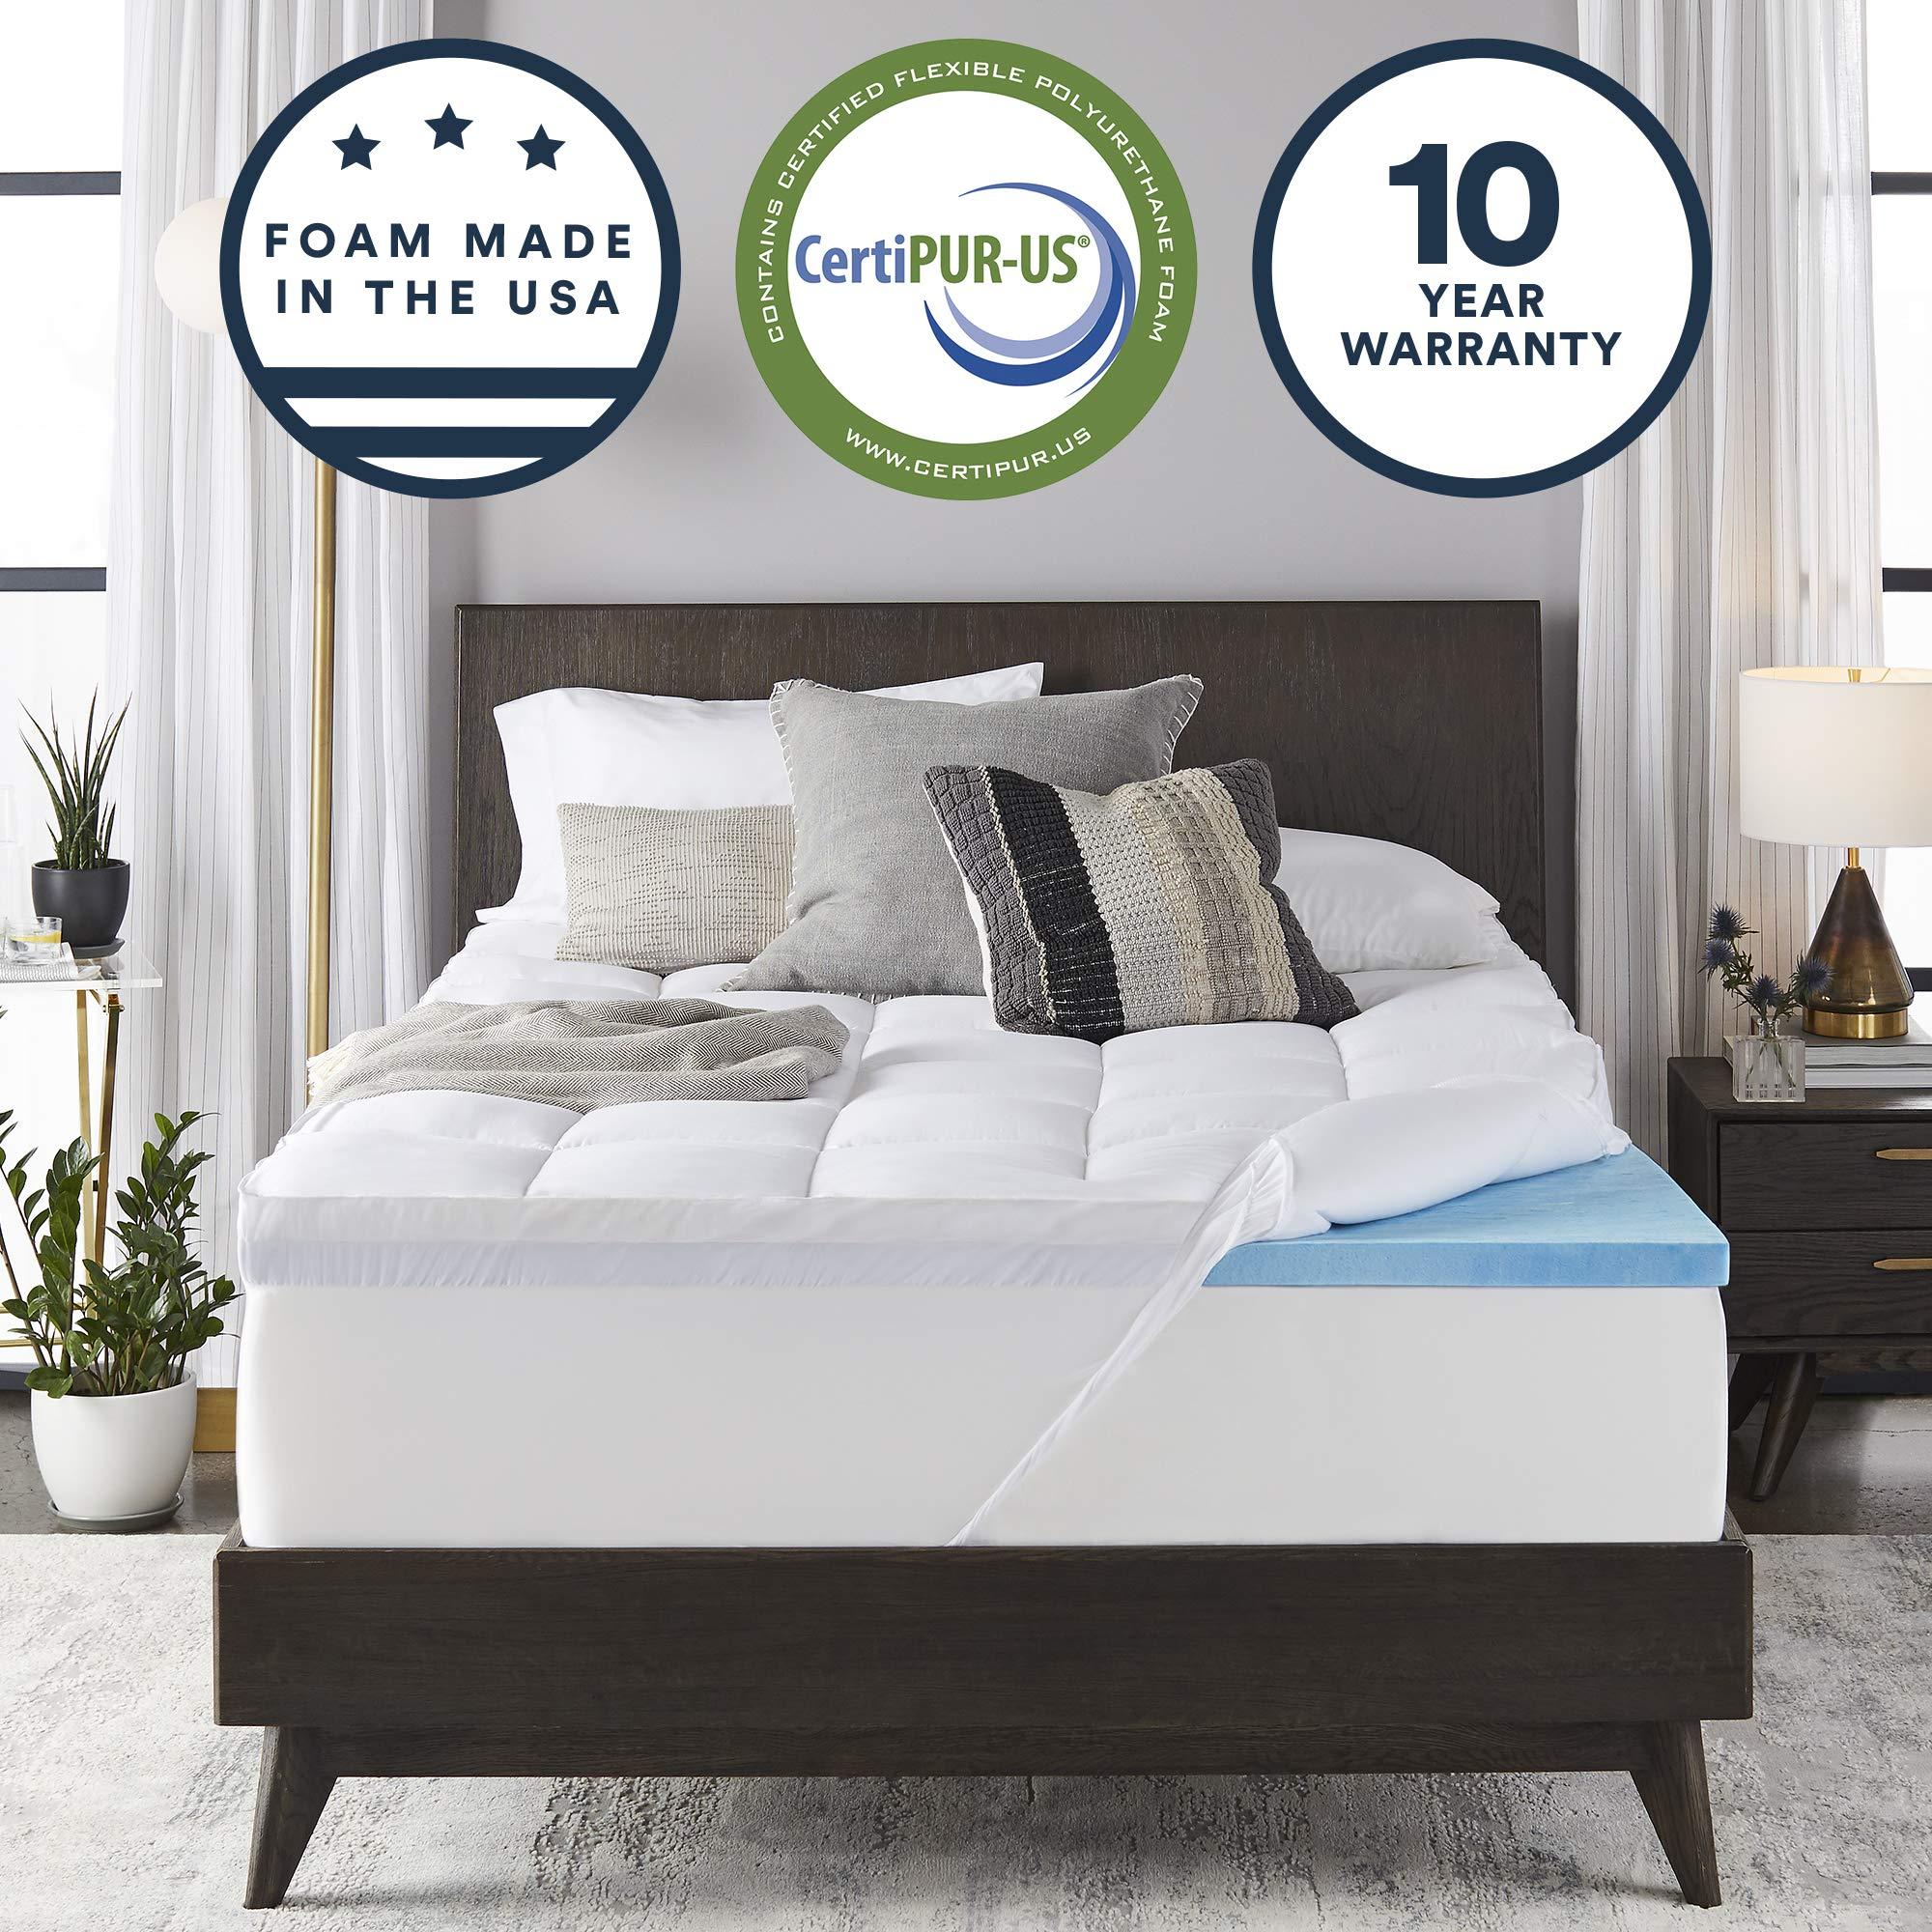 Sleep Innovations Mattress 10 Year Warranty